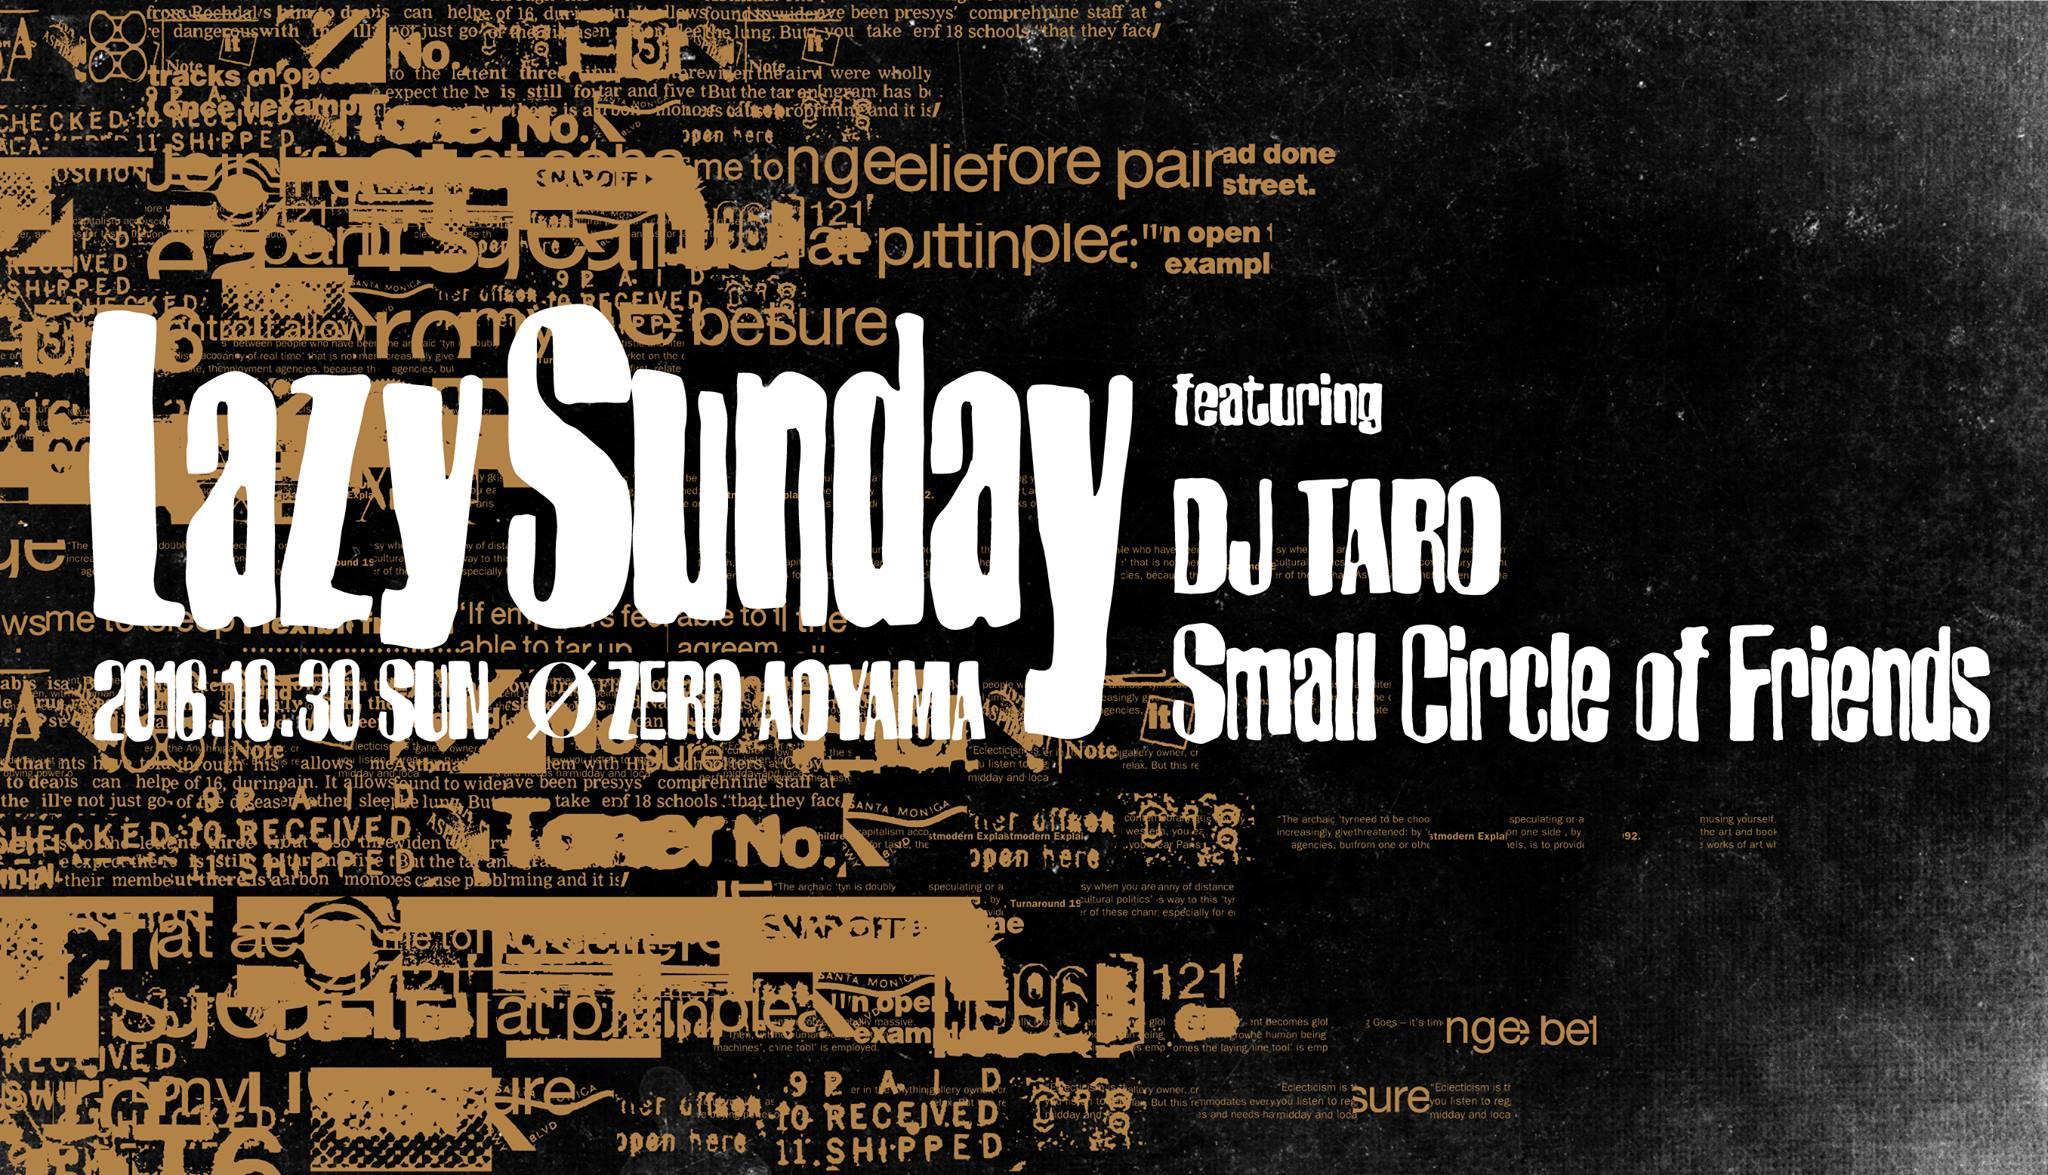 Lazy Sunday  featuring  DJ TARO & Small Circle of Friends